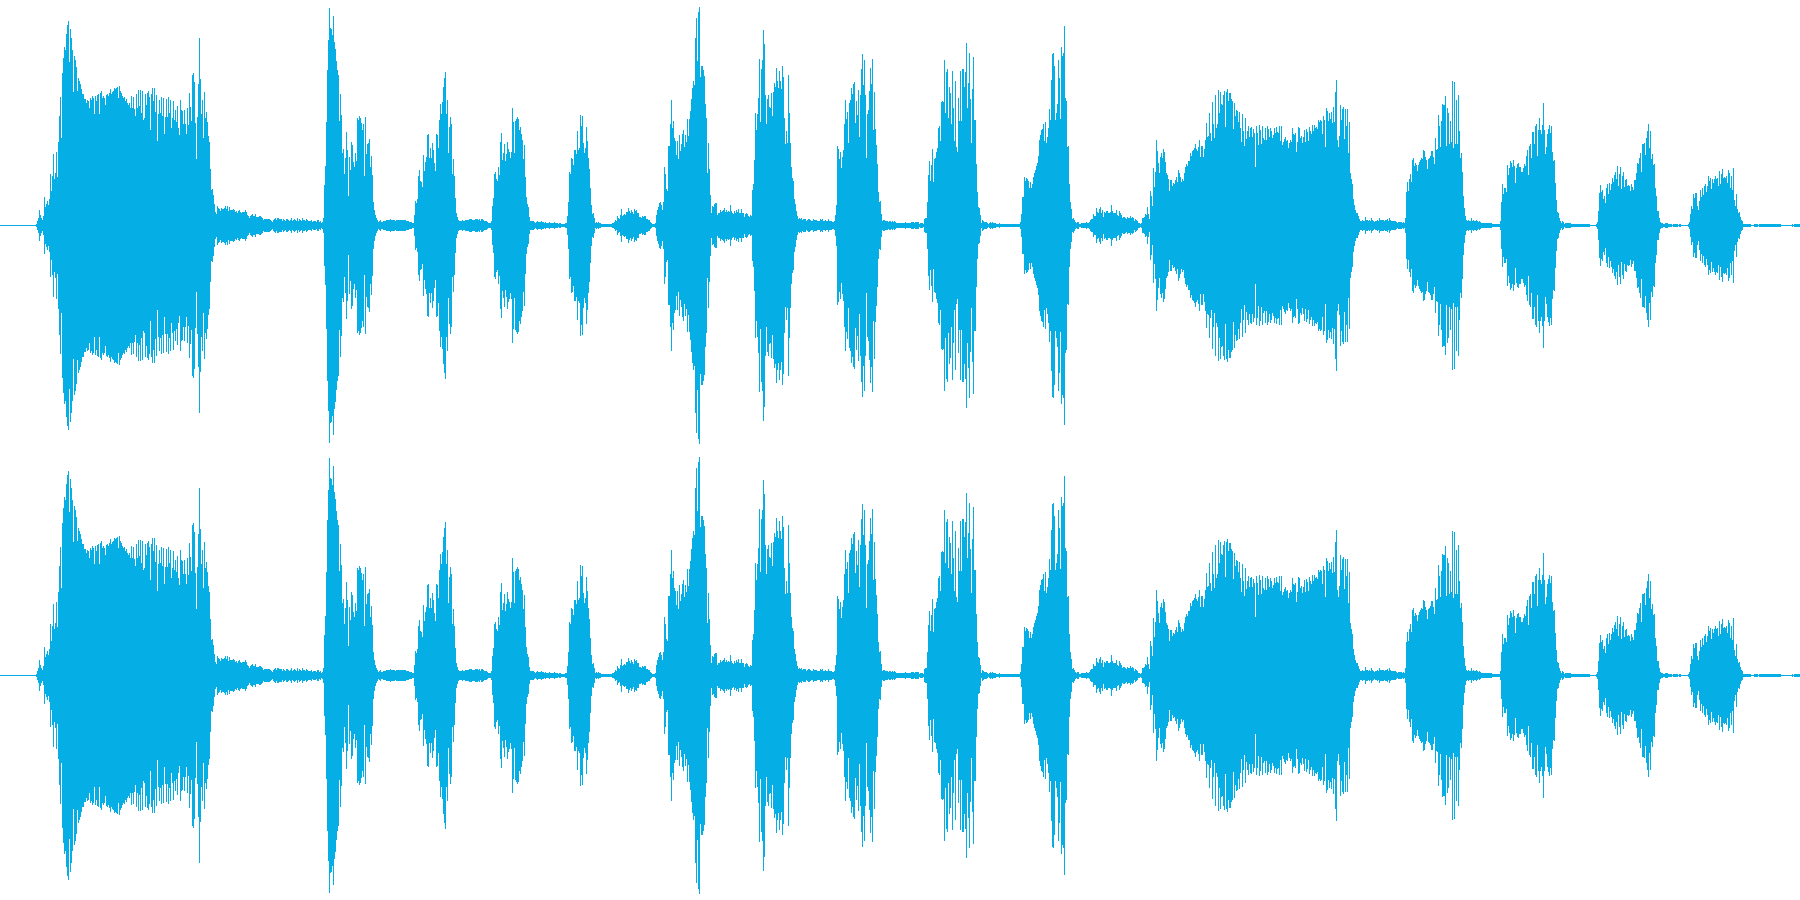 Long Laugh Voice_Malの再生済みの波形